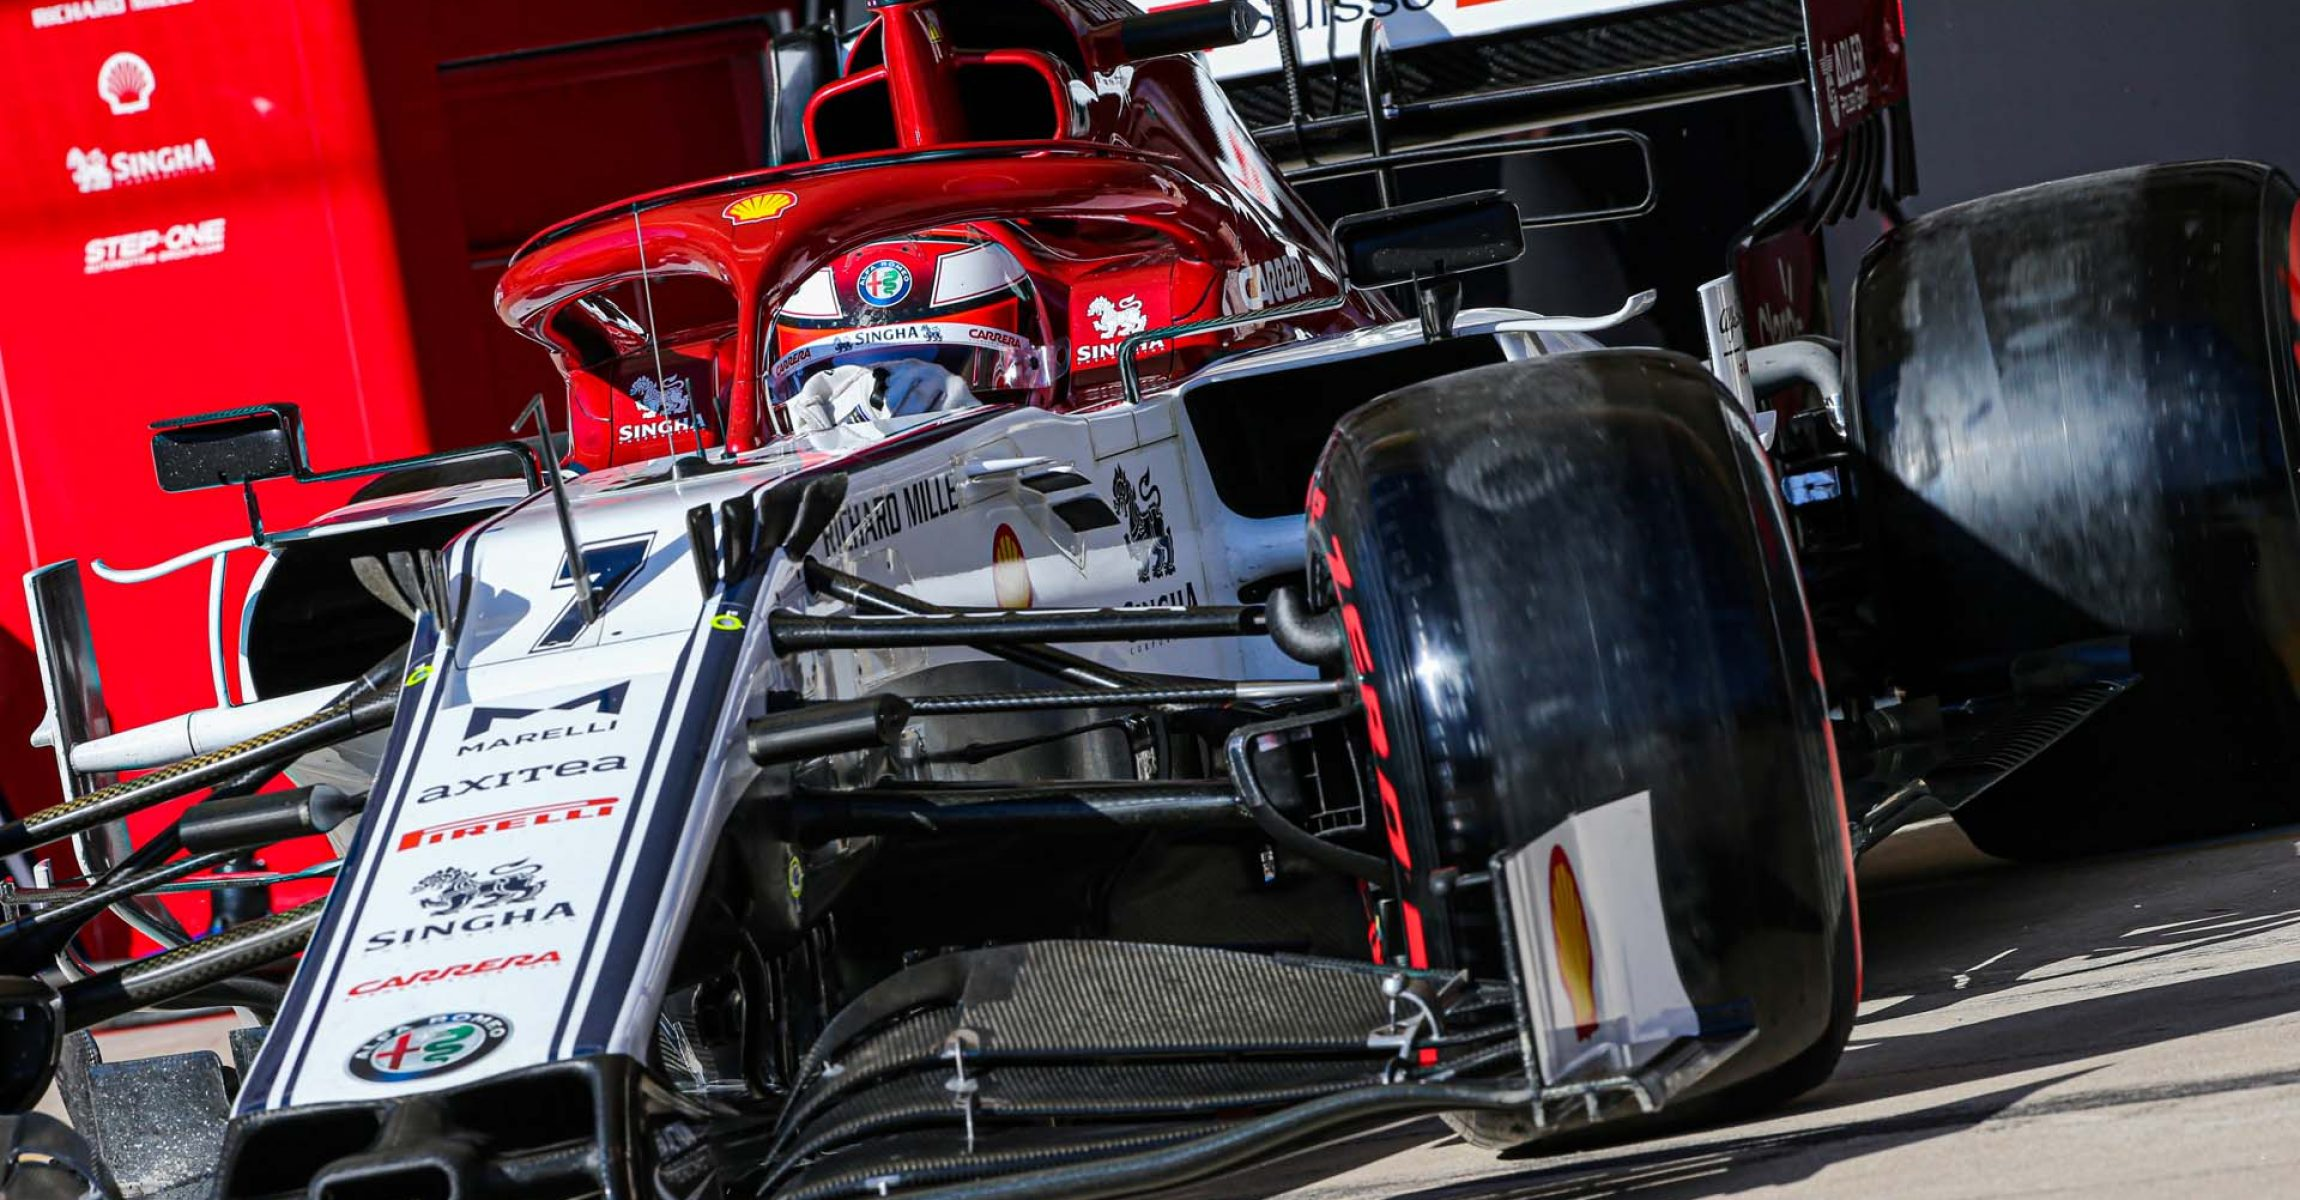 07 RAIKKONEN Kimi Räikkönen (fin), Alfa Romeo Racing C38, action during the 2019 Formula One World Championship, United States of America Grand Prix from november 1 to 3 in Austin, Texas, USA - Photo Francois Flamand / DPPI